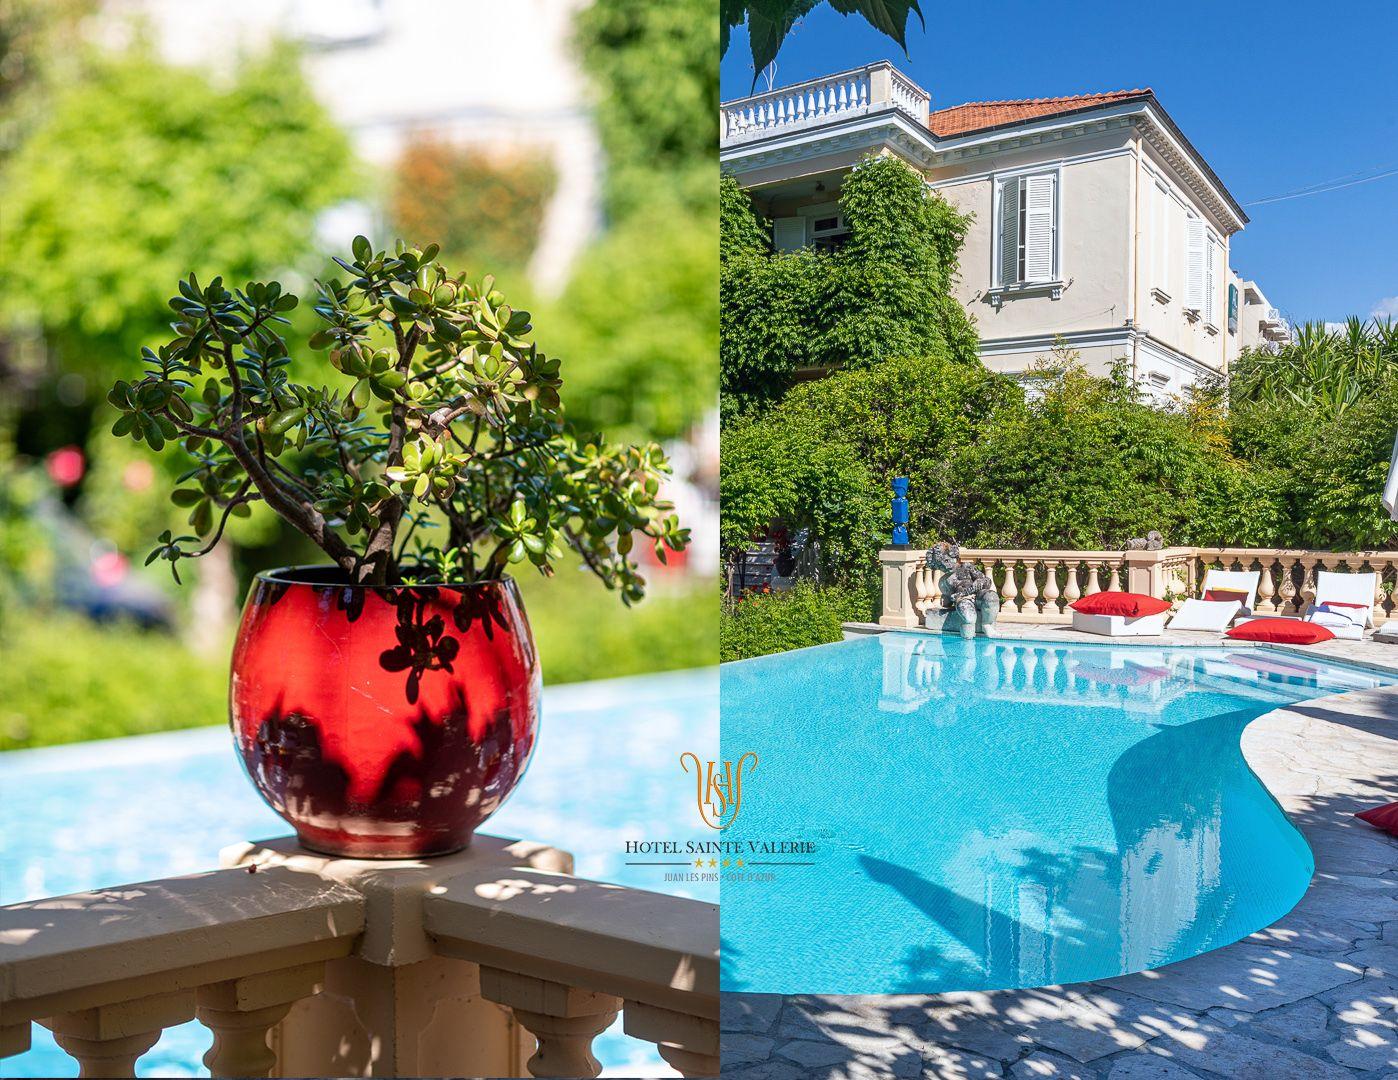 Late summer dream in Juan les Pins …  Les derniers jours de la saison 2019 restent merveilleux : profitez-en vite jusqu'au 12 octobre ! Tel. (33) 04 93 610 715  #HotelSainteValerie #BePrivileged #Luxury #Intimate #Confidential #Chill #Guest #LateSummer #Charm #HotelPool #EteIndien #IndianSummer #Garden #Pool #Provencal #Beautiful #CotedAzurFrance #Antibes #CapdAntibes